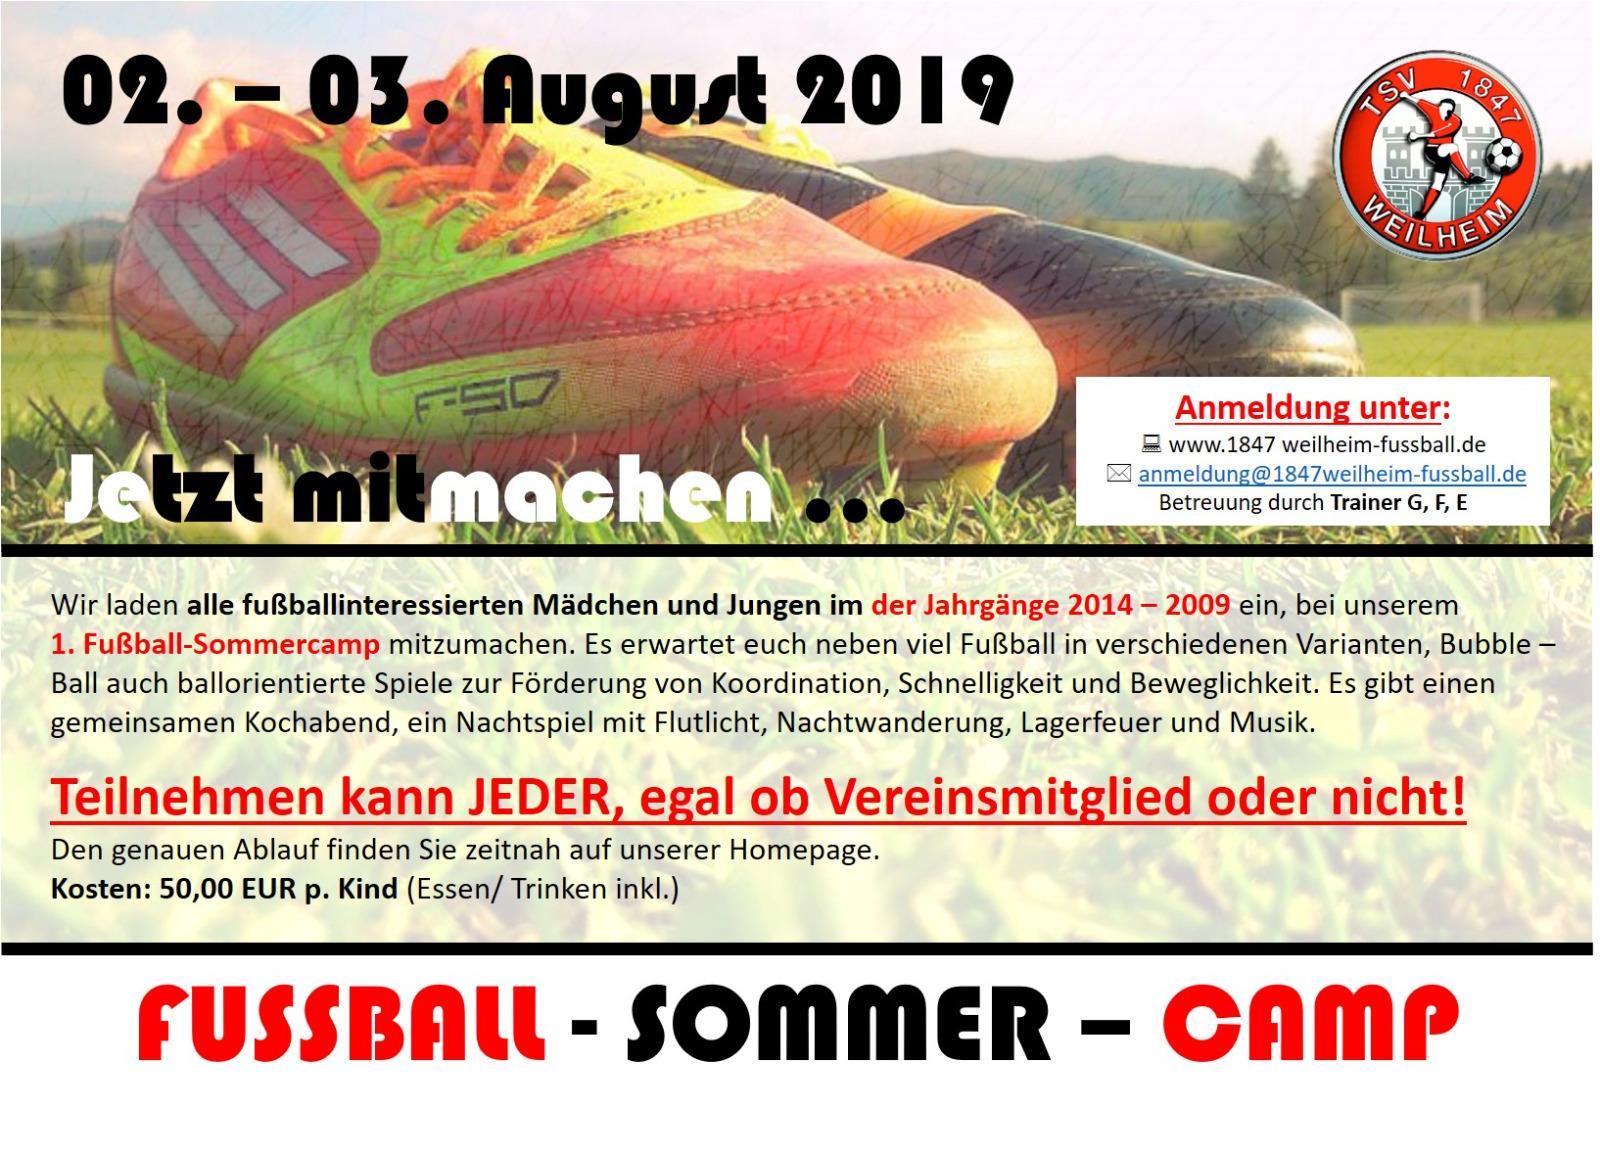 Sommer-Camp